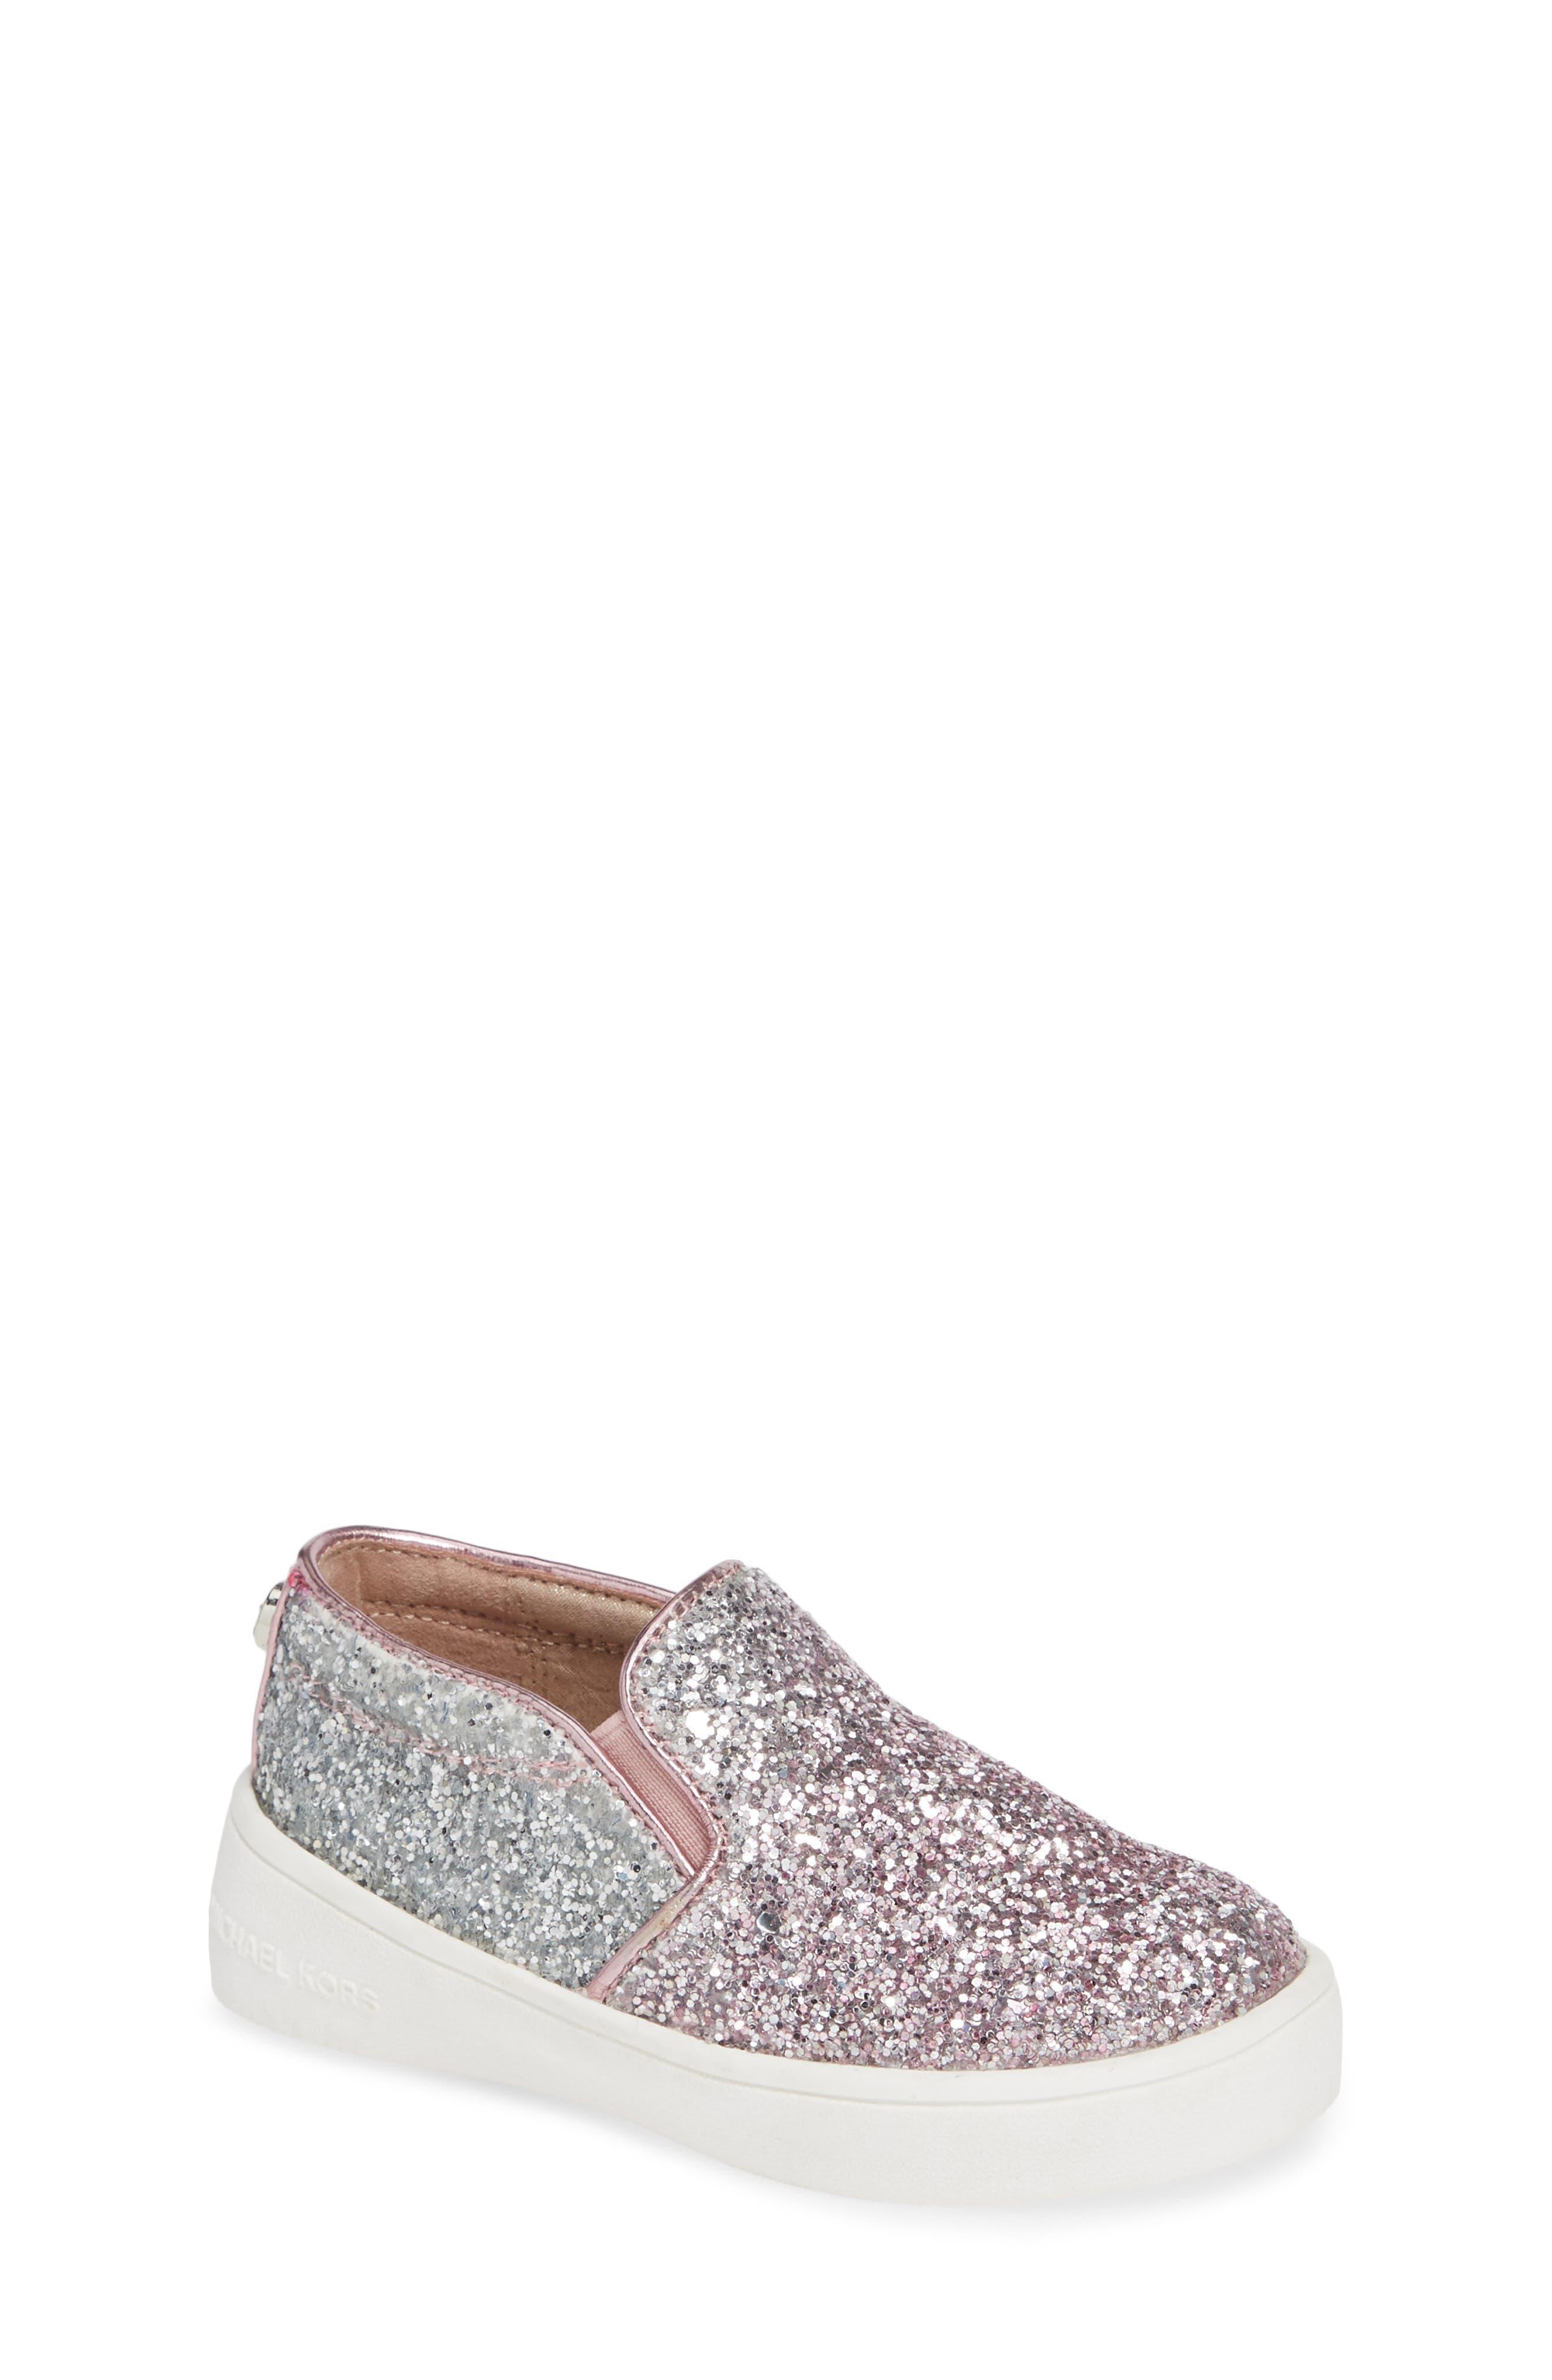 Ivy Ombré Glitter Slip-On Sneaker,                         Main,                         color, Pink Silver